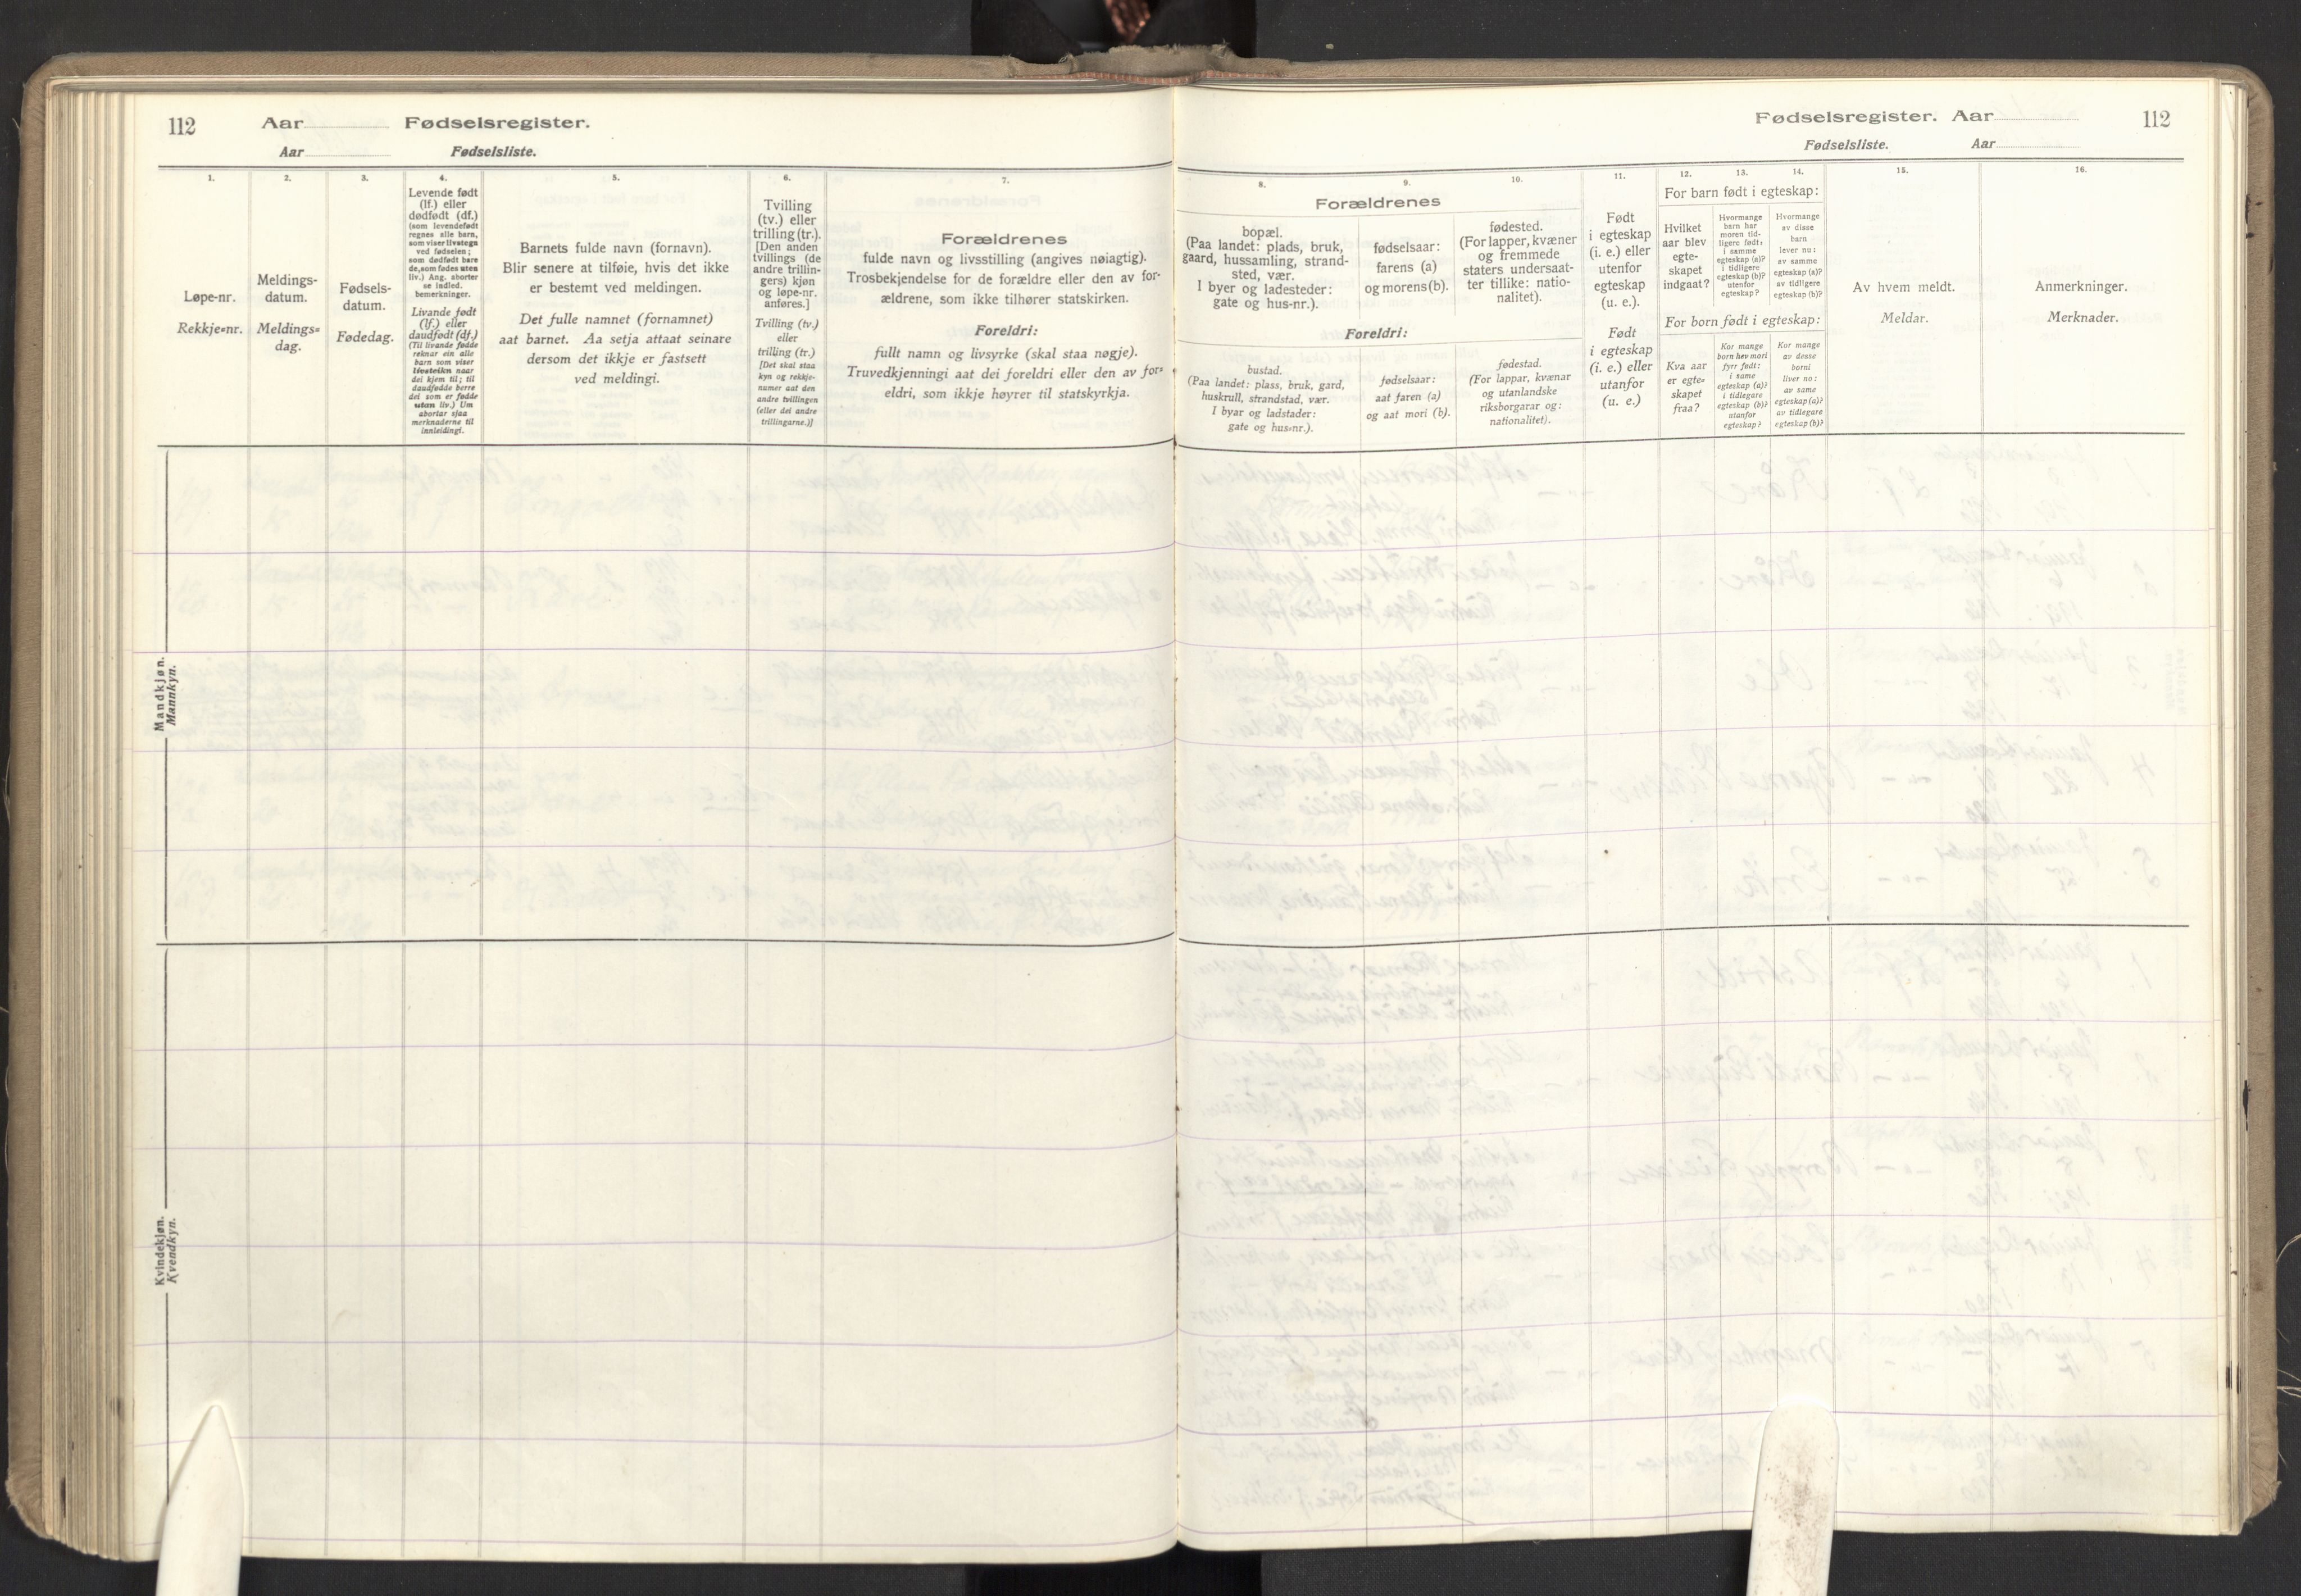 SAO, Eidsvoll prestekontor Kirkebøker, Birth register no. I 1, 1916-1924, p. 112